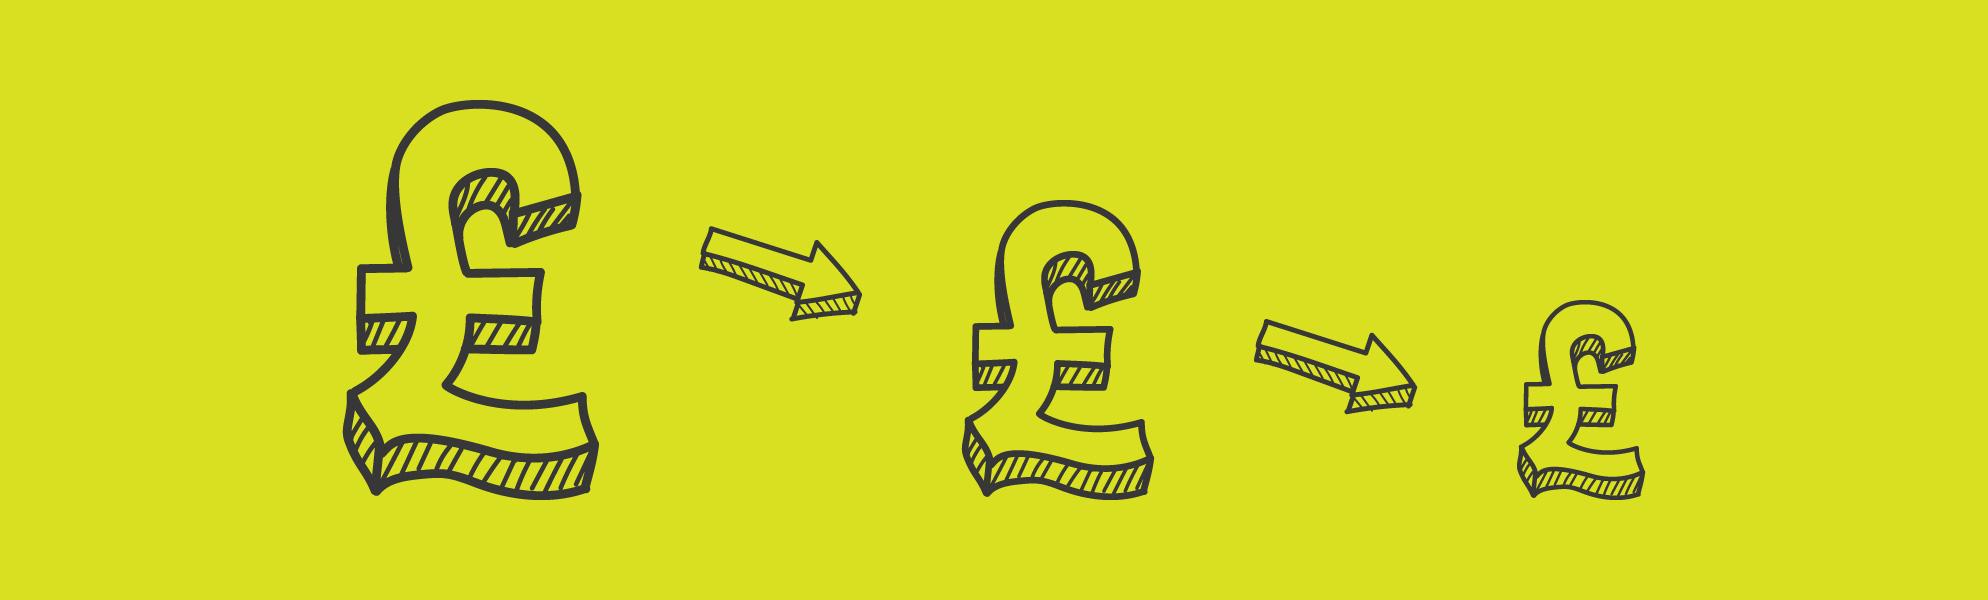 Reduce flexo costs with ECG